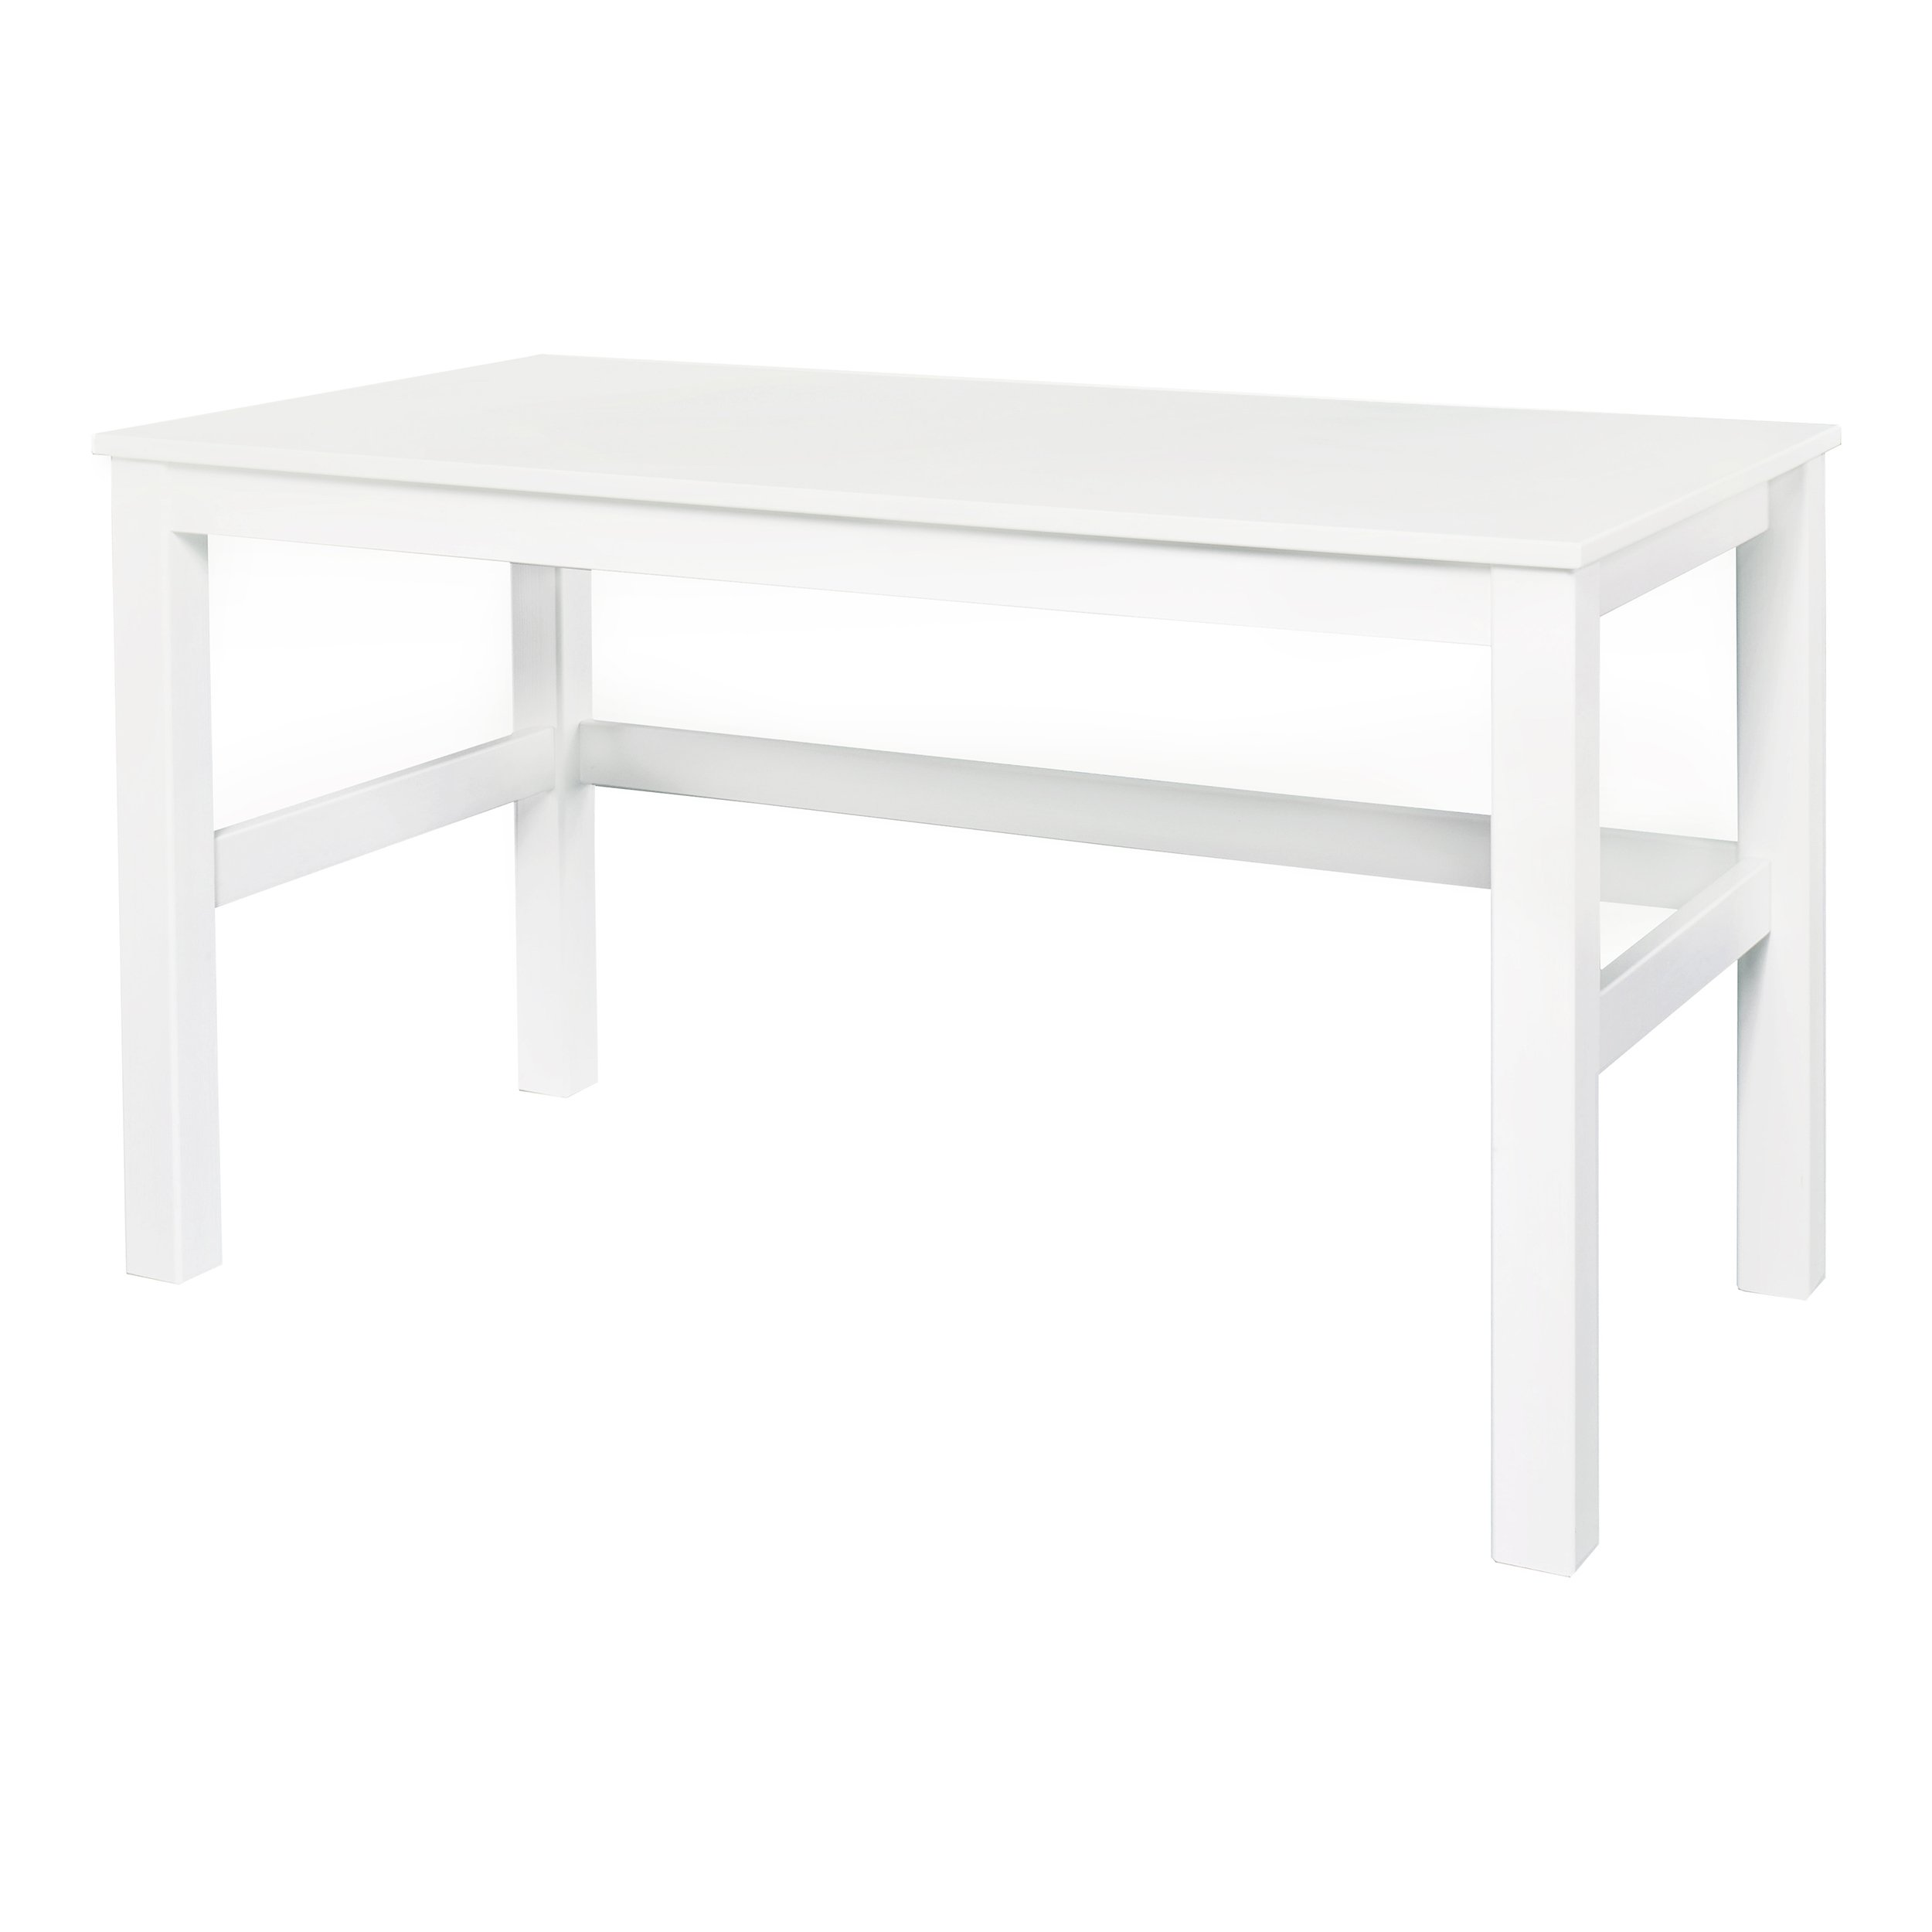 Hoppekids - MAJA Desk